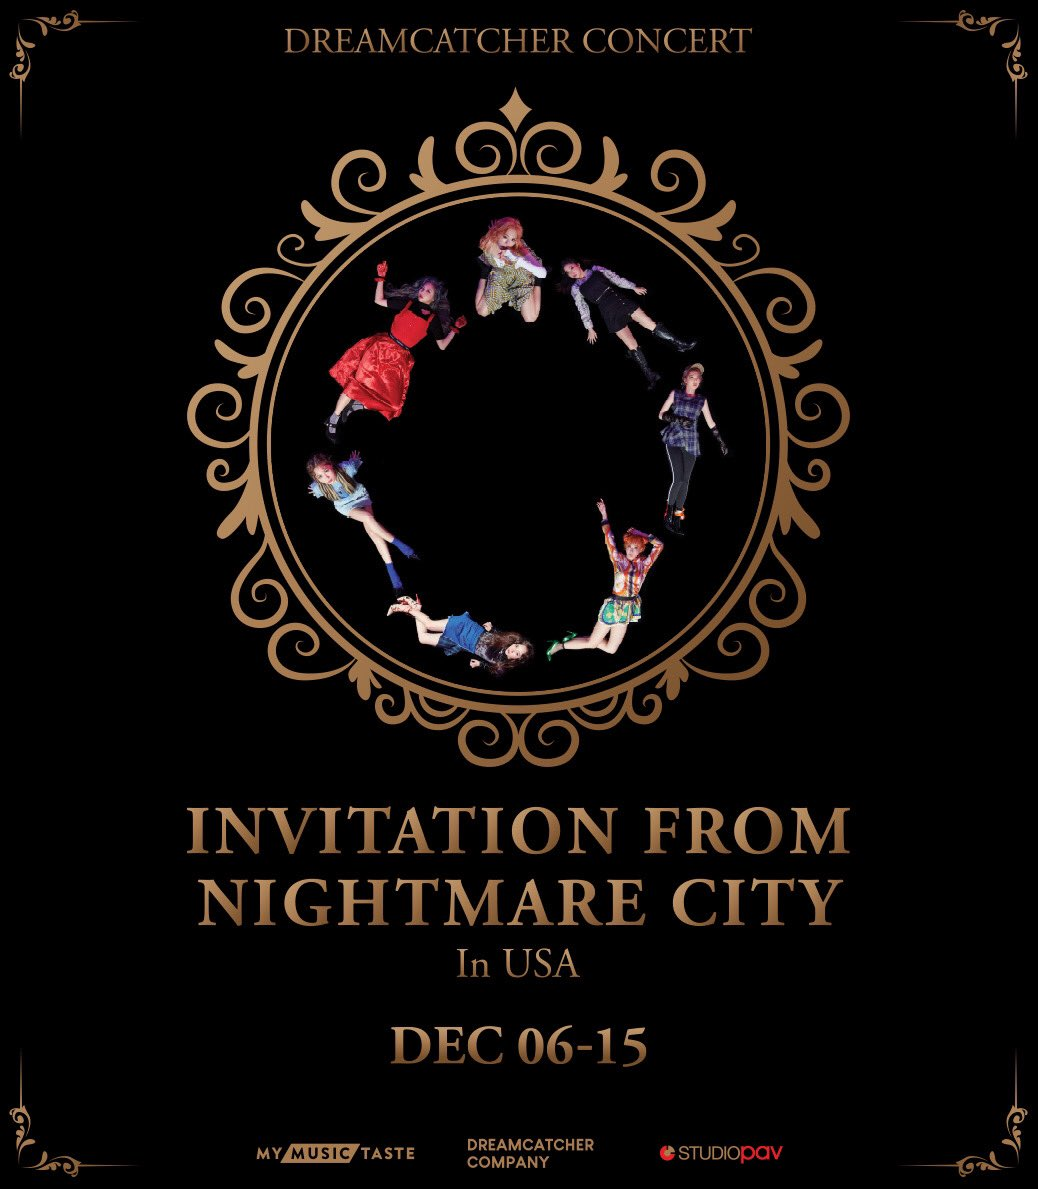 DreamCatcher-Invitation-from-Nightmare-City-in-USA